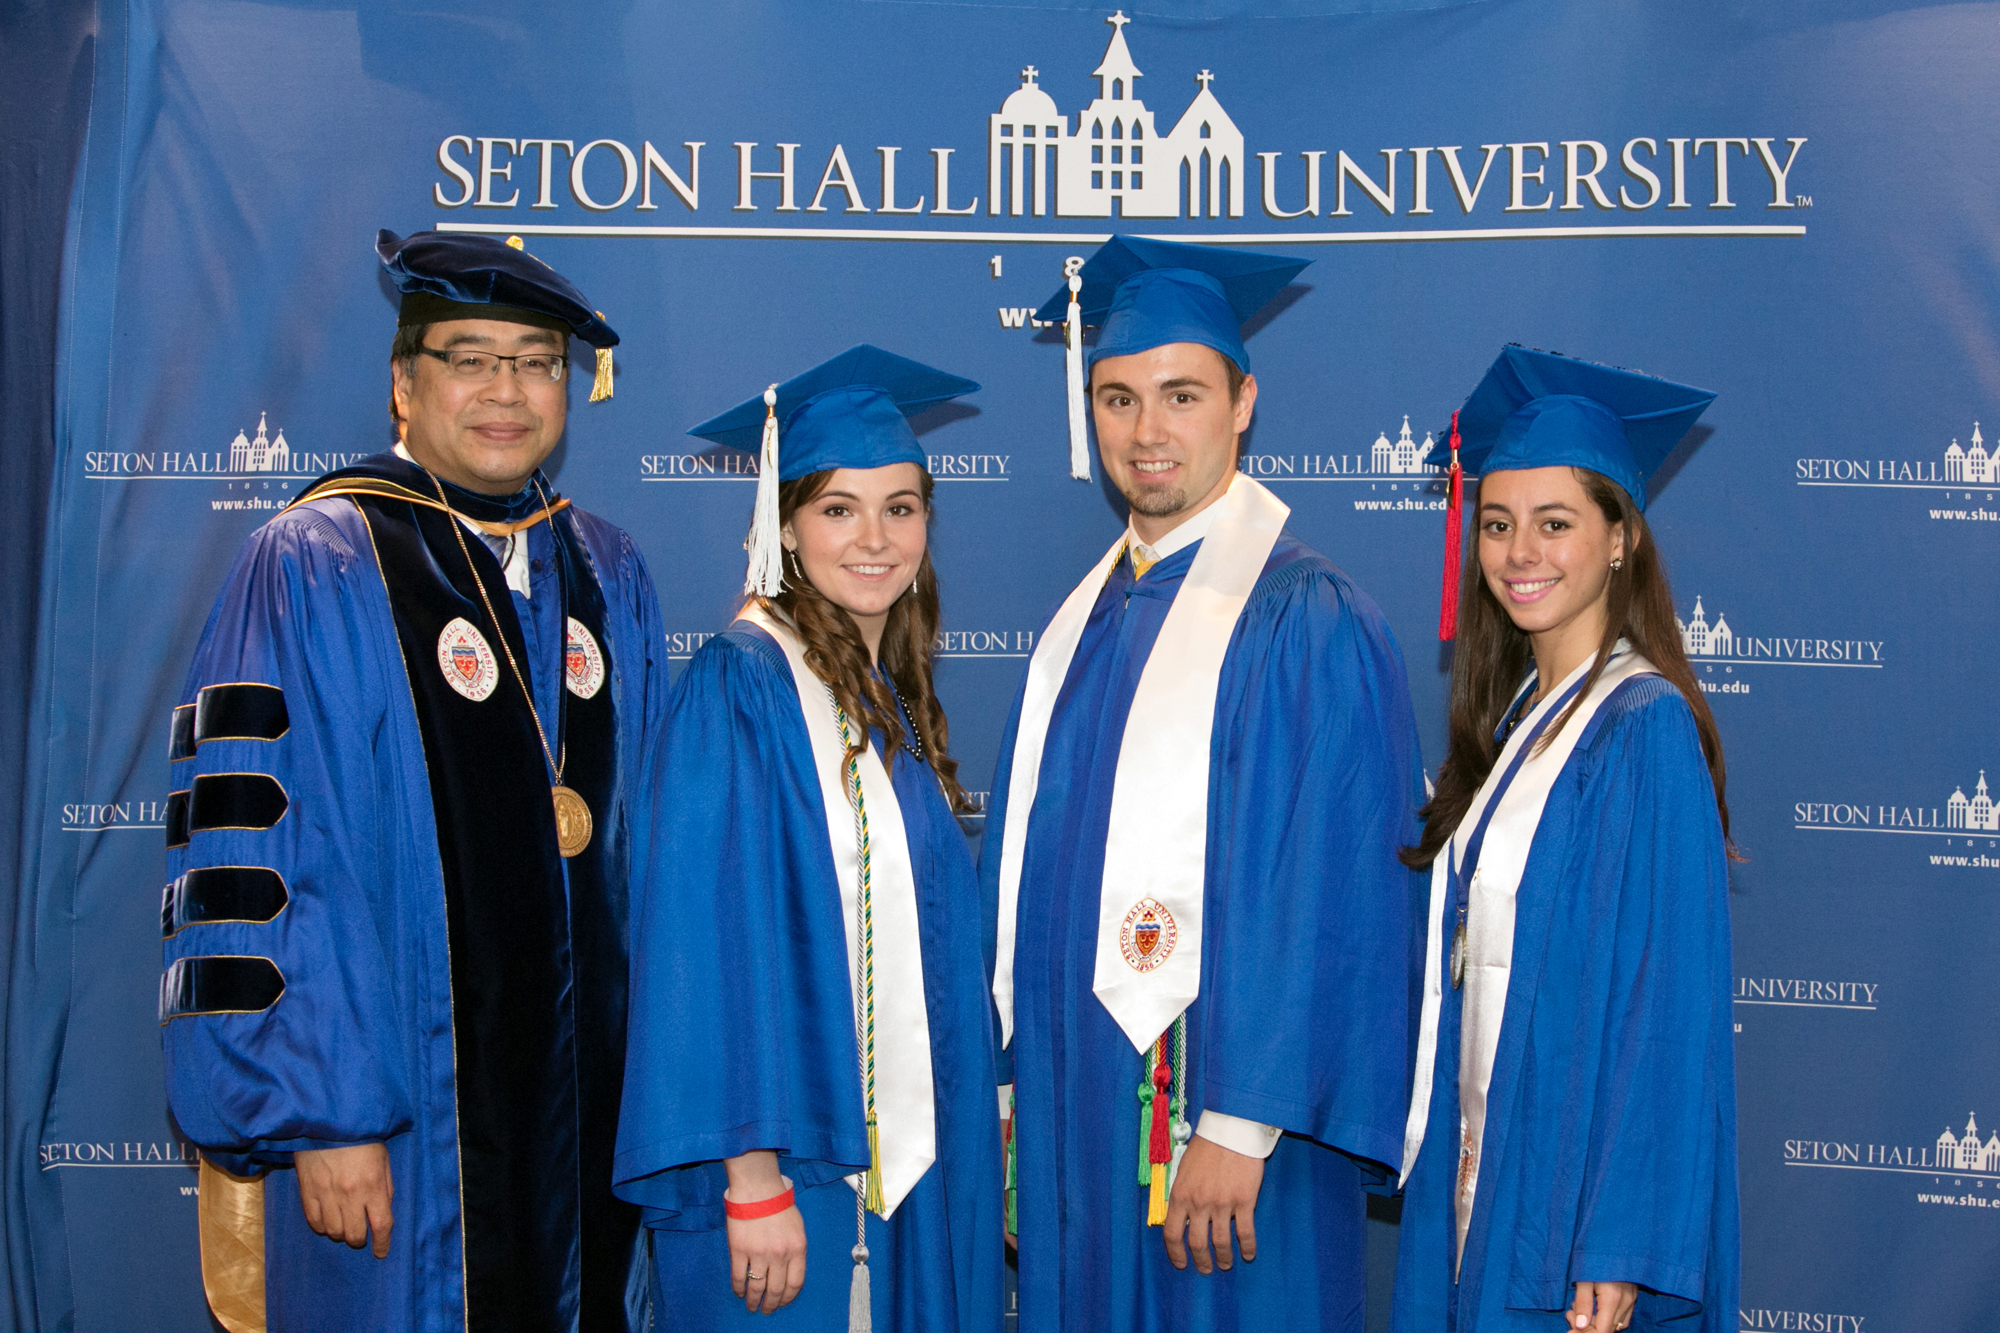 seton hall medical school application